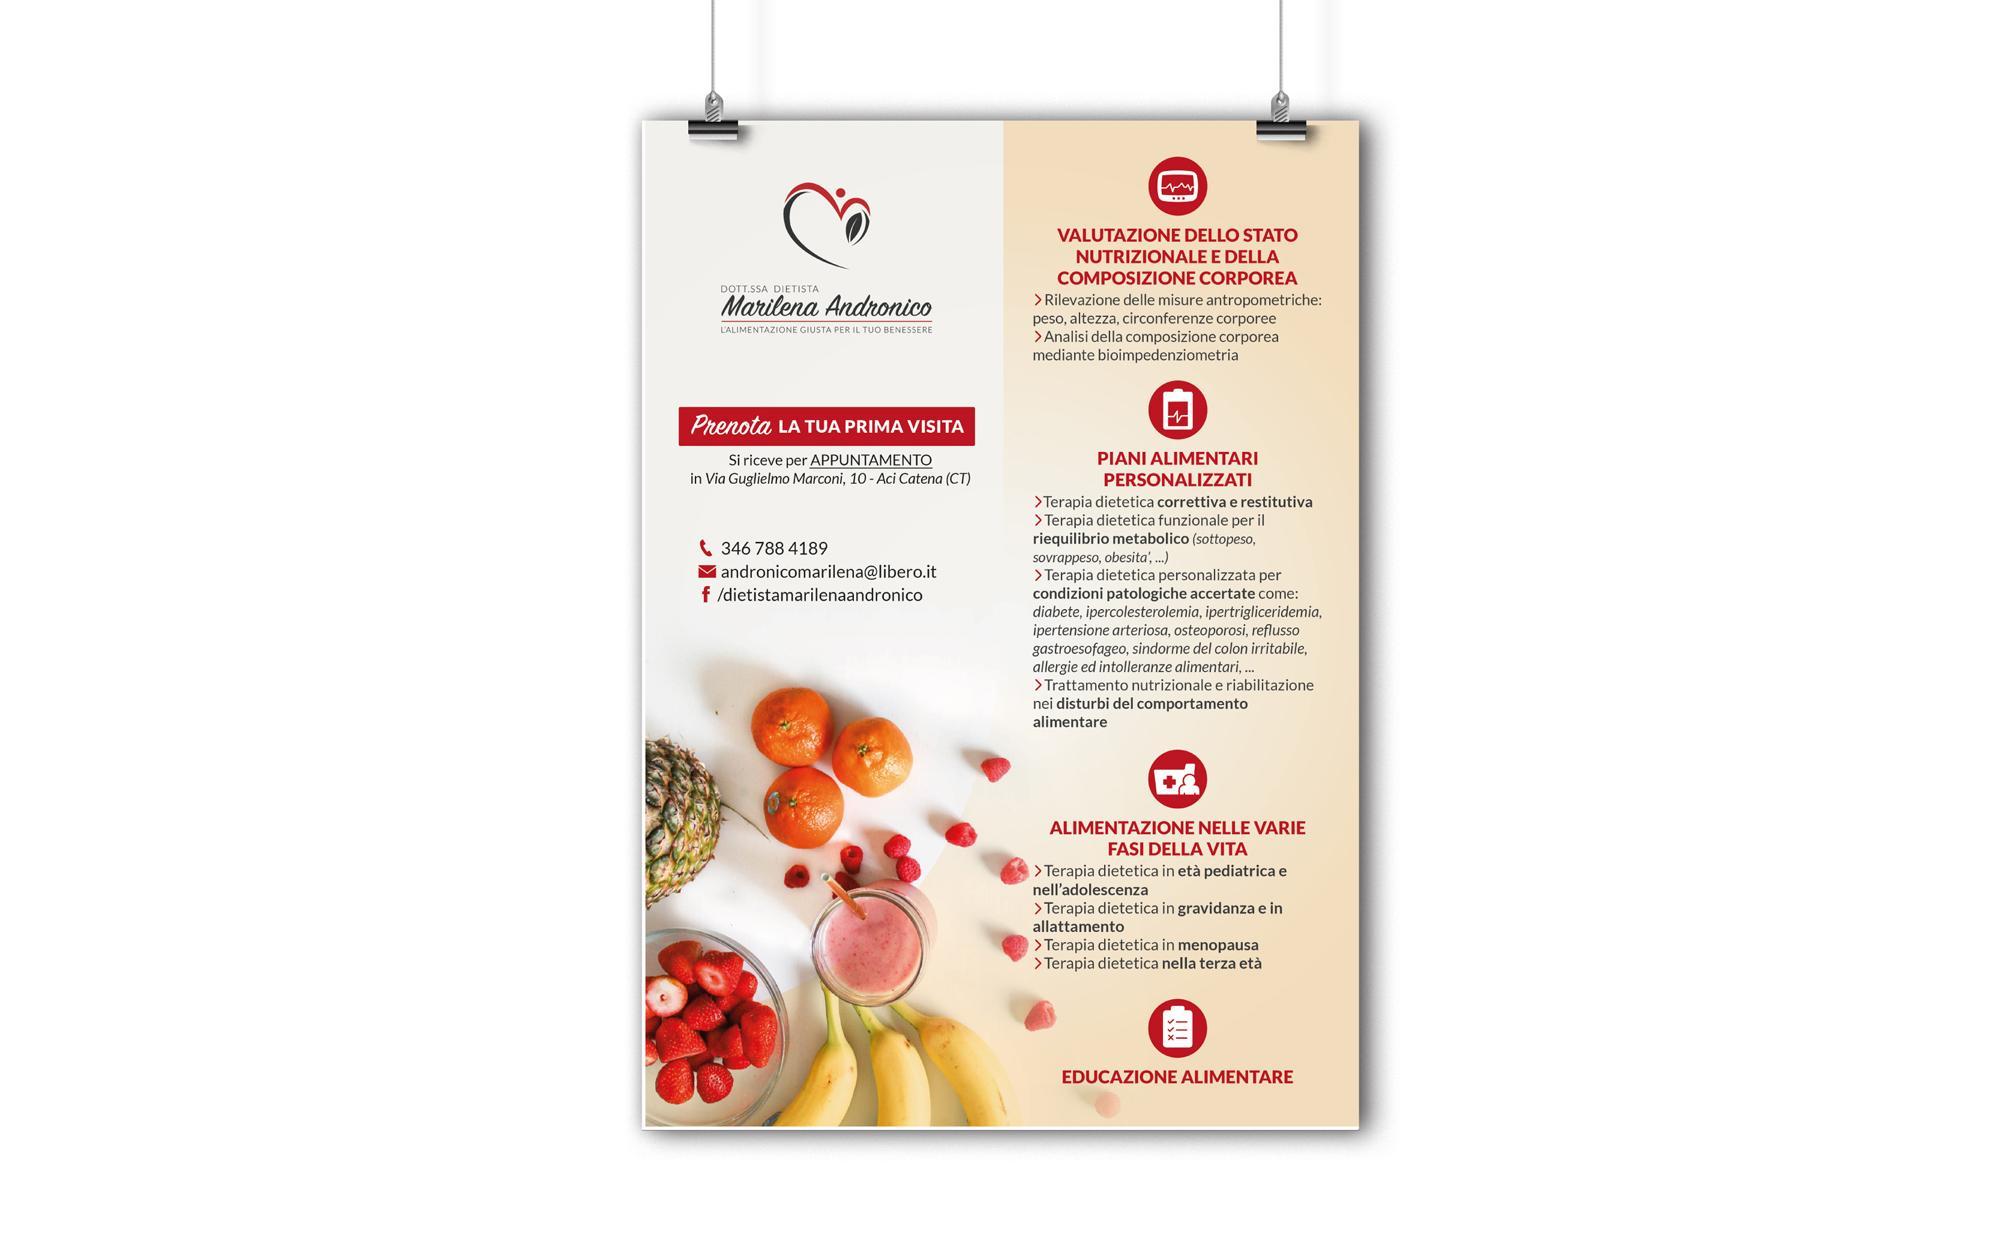 programmi dietetici per nutrizionisticki